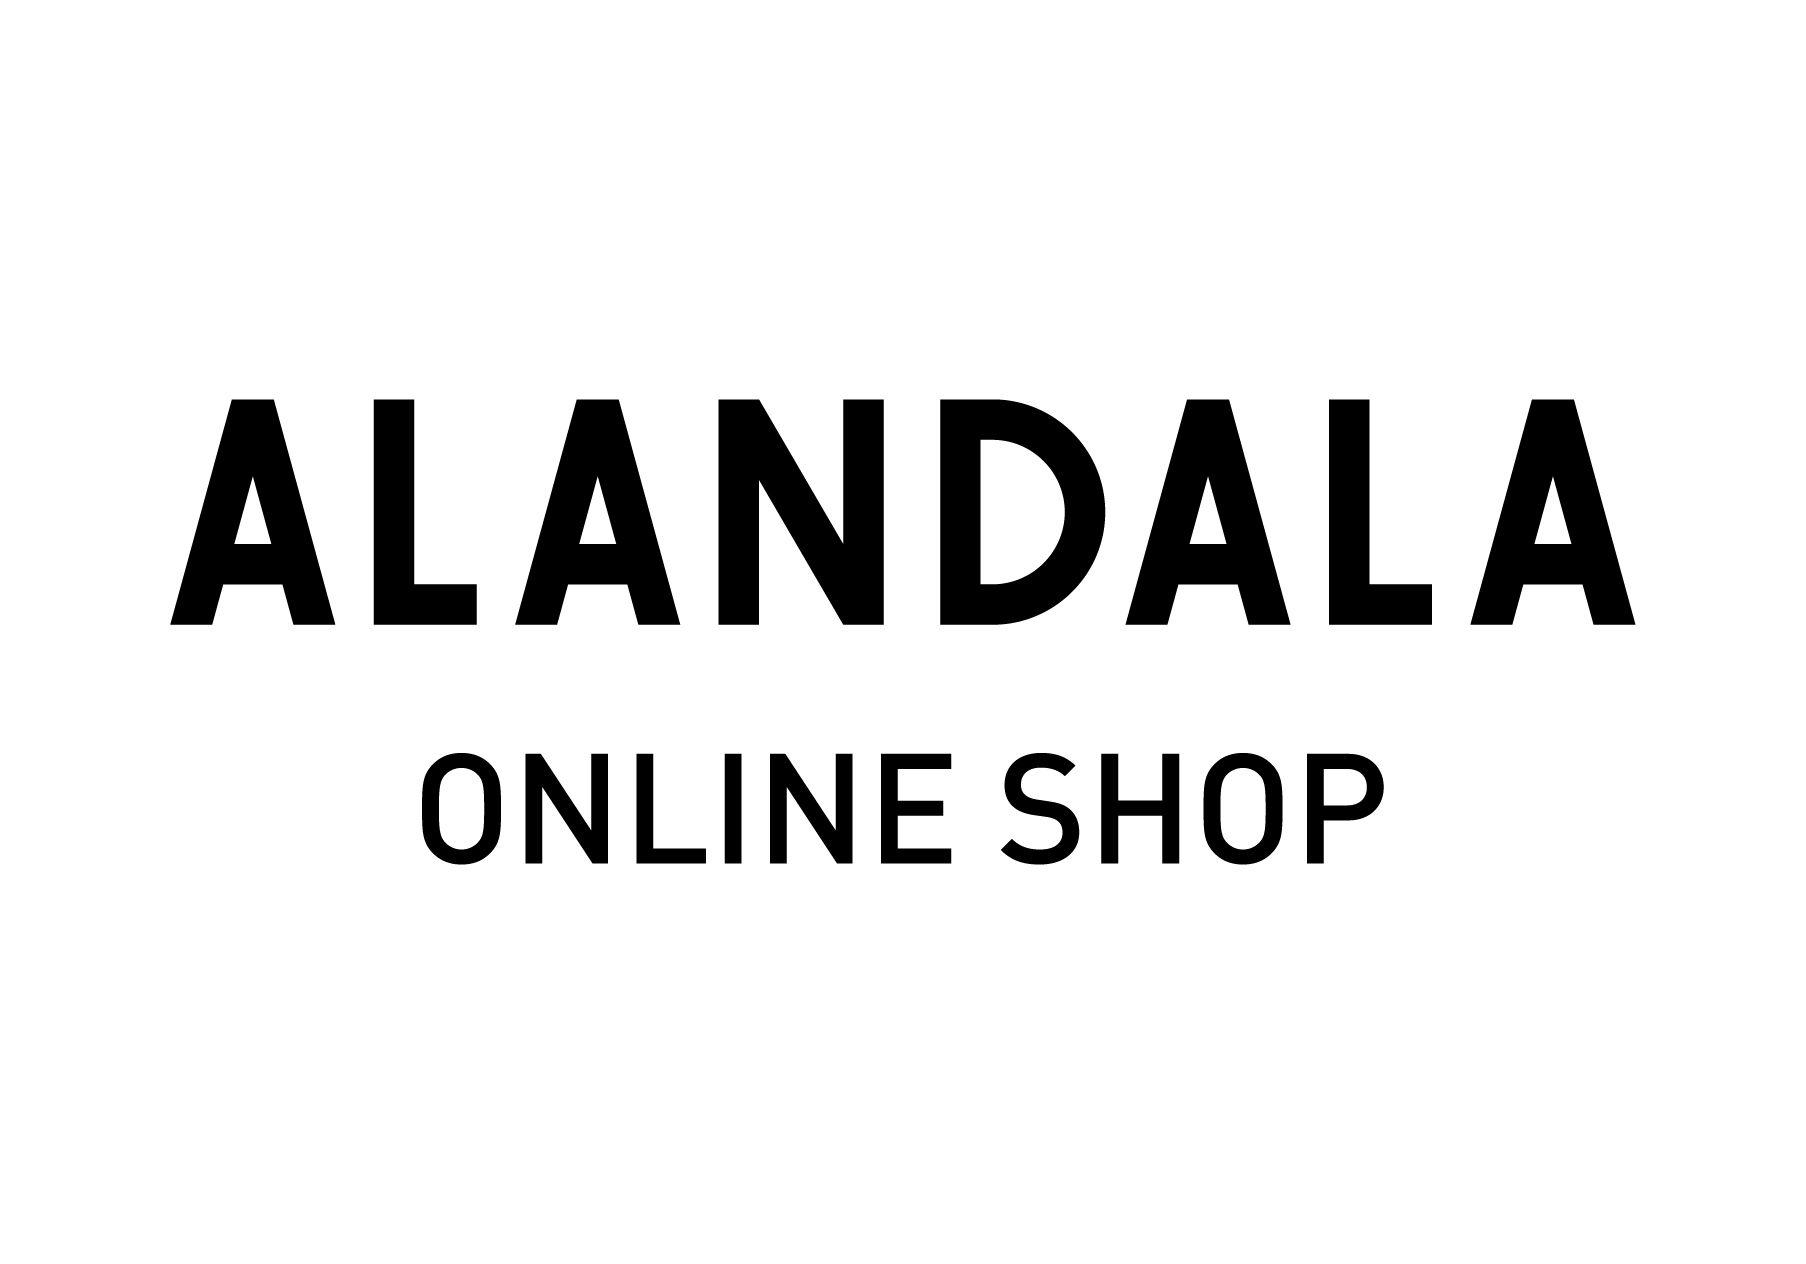 ALANDALA ONLINE SHOP